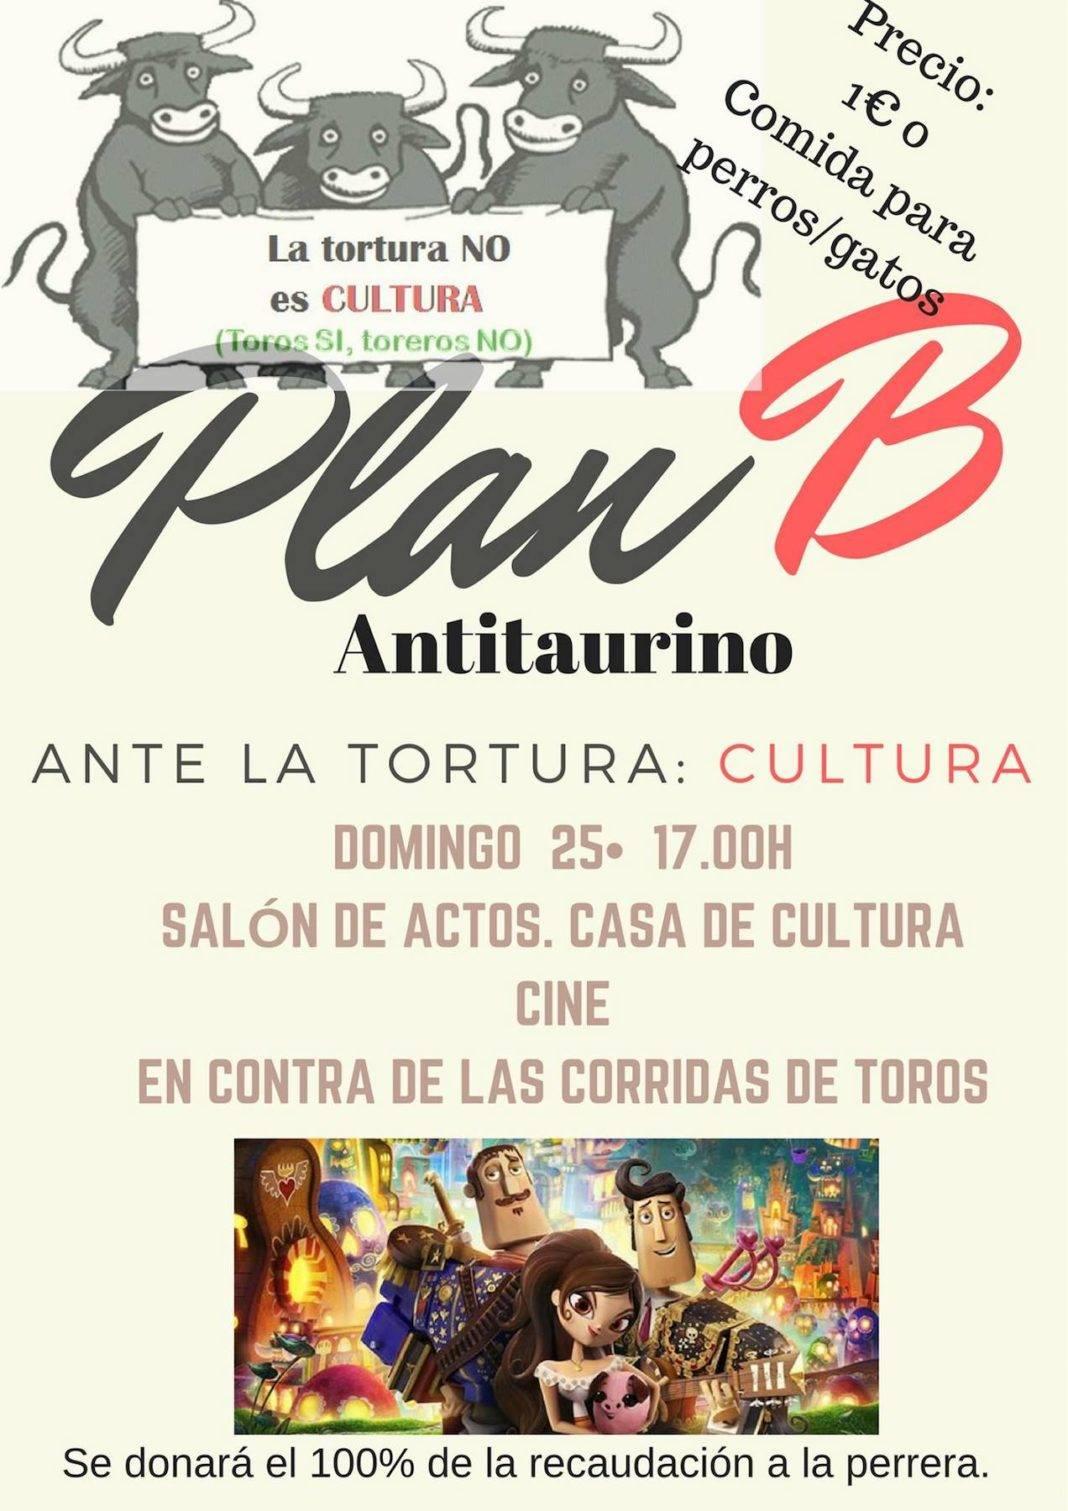 plan b antitaurino feria herencia 2018 1068x1511 - Este año de momento sin Plan B Antitaurino para la Feria y Fiestas en Herencia